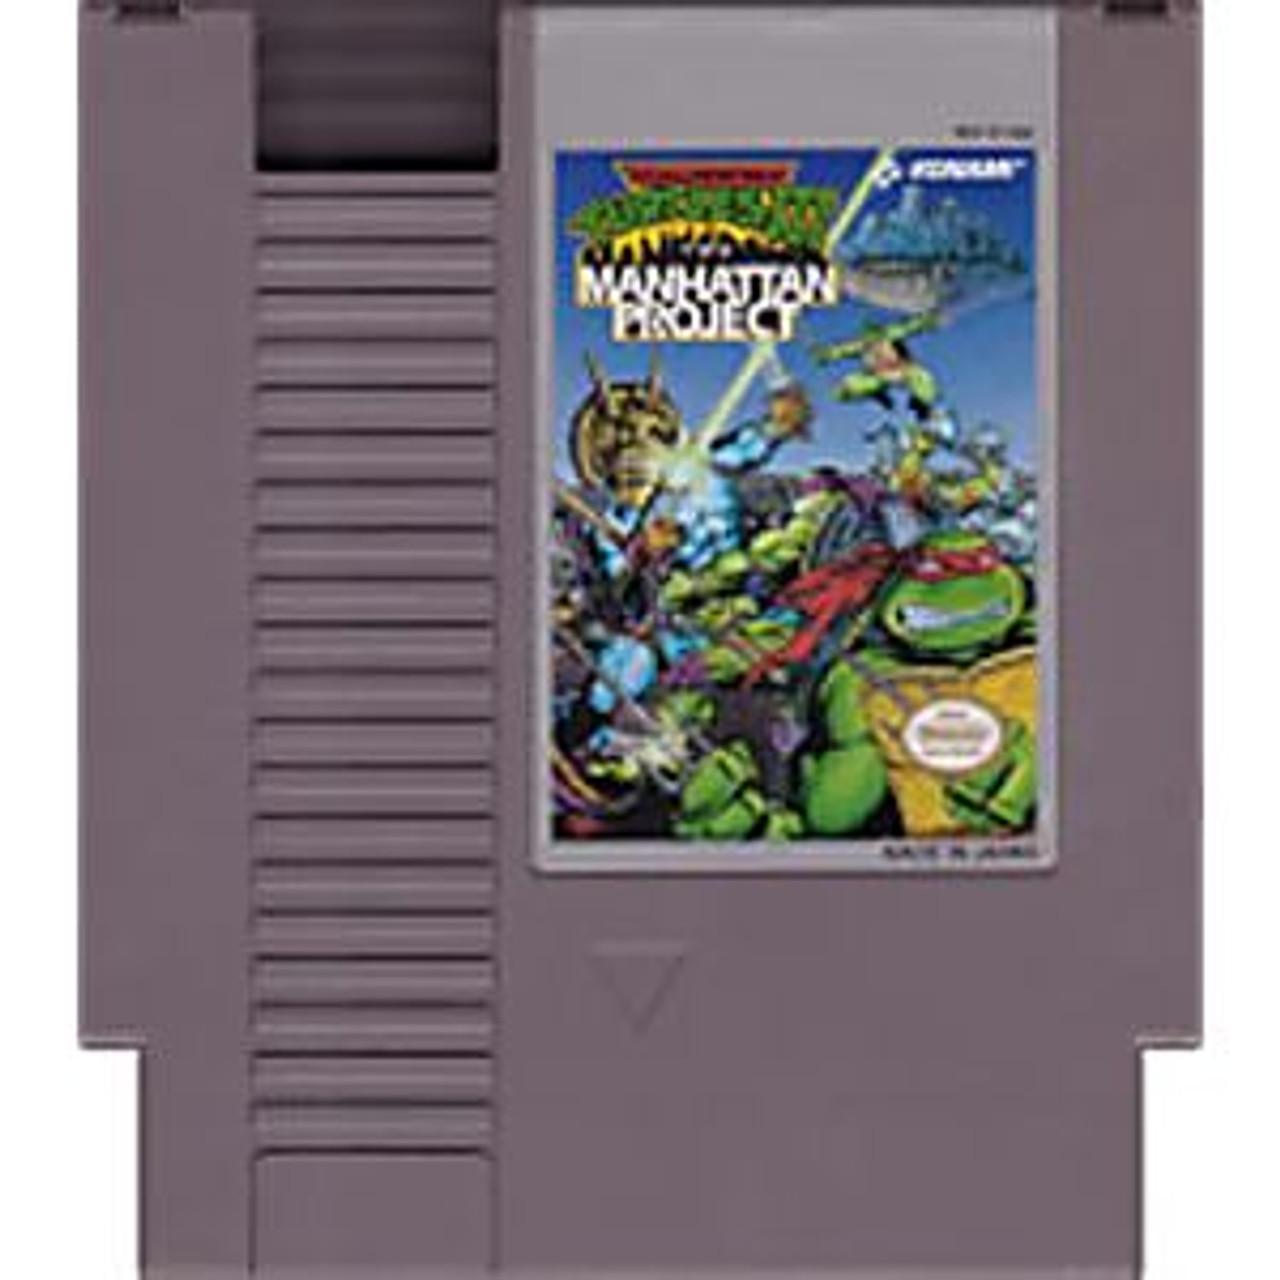 TMNT III THE MANHATTAN PROJECT - NES